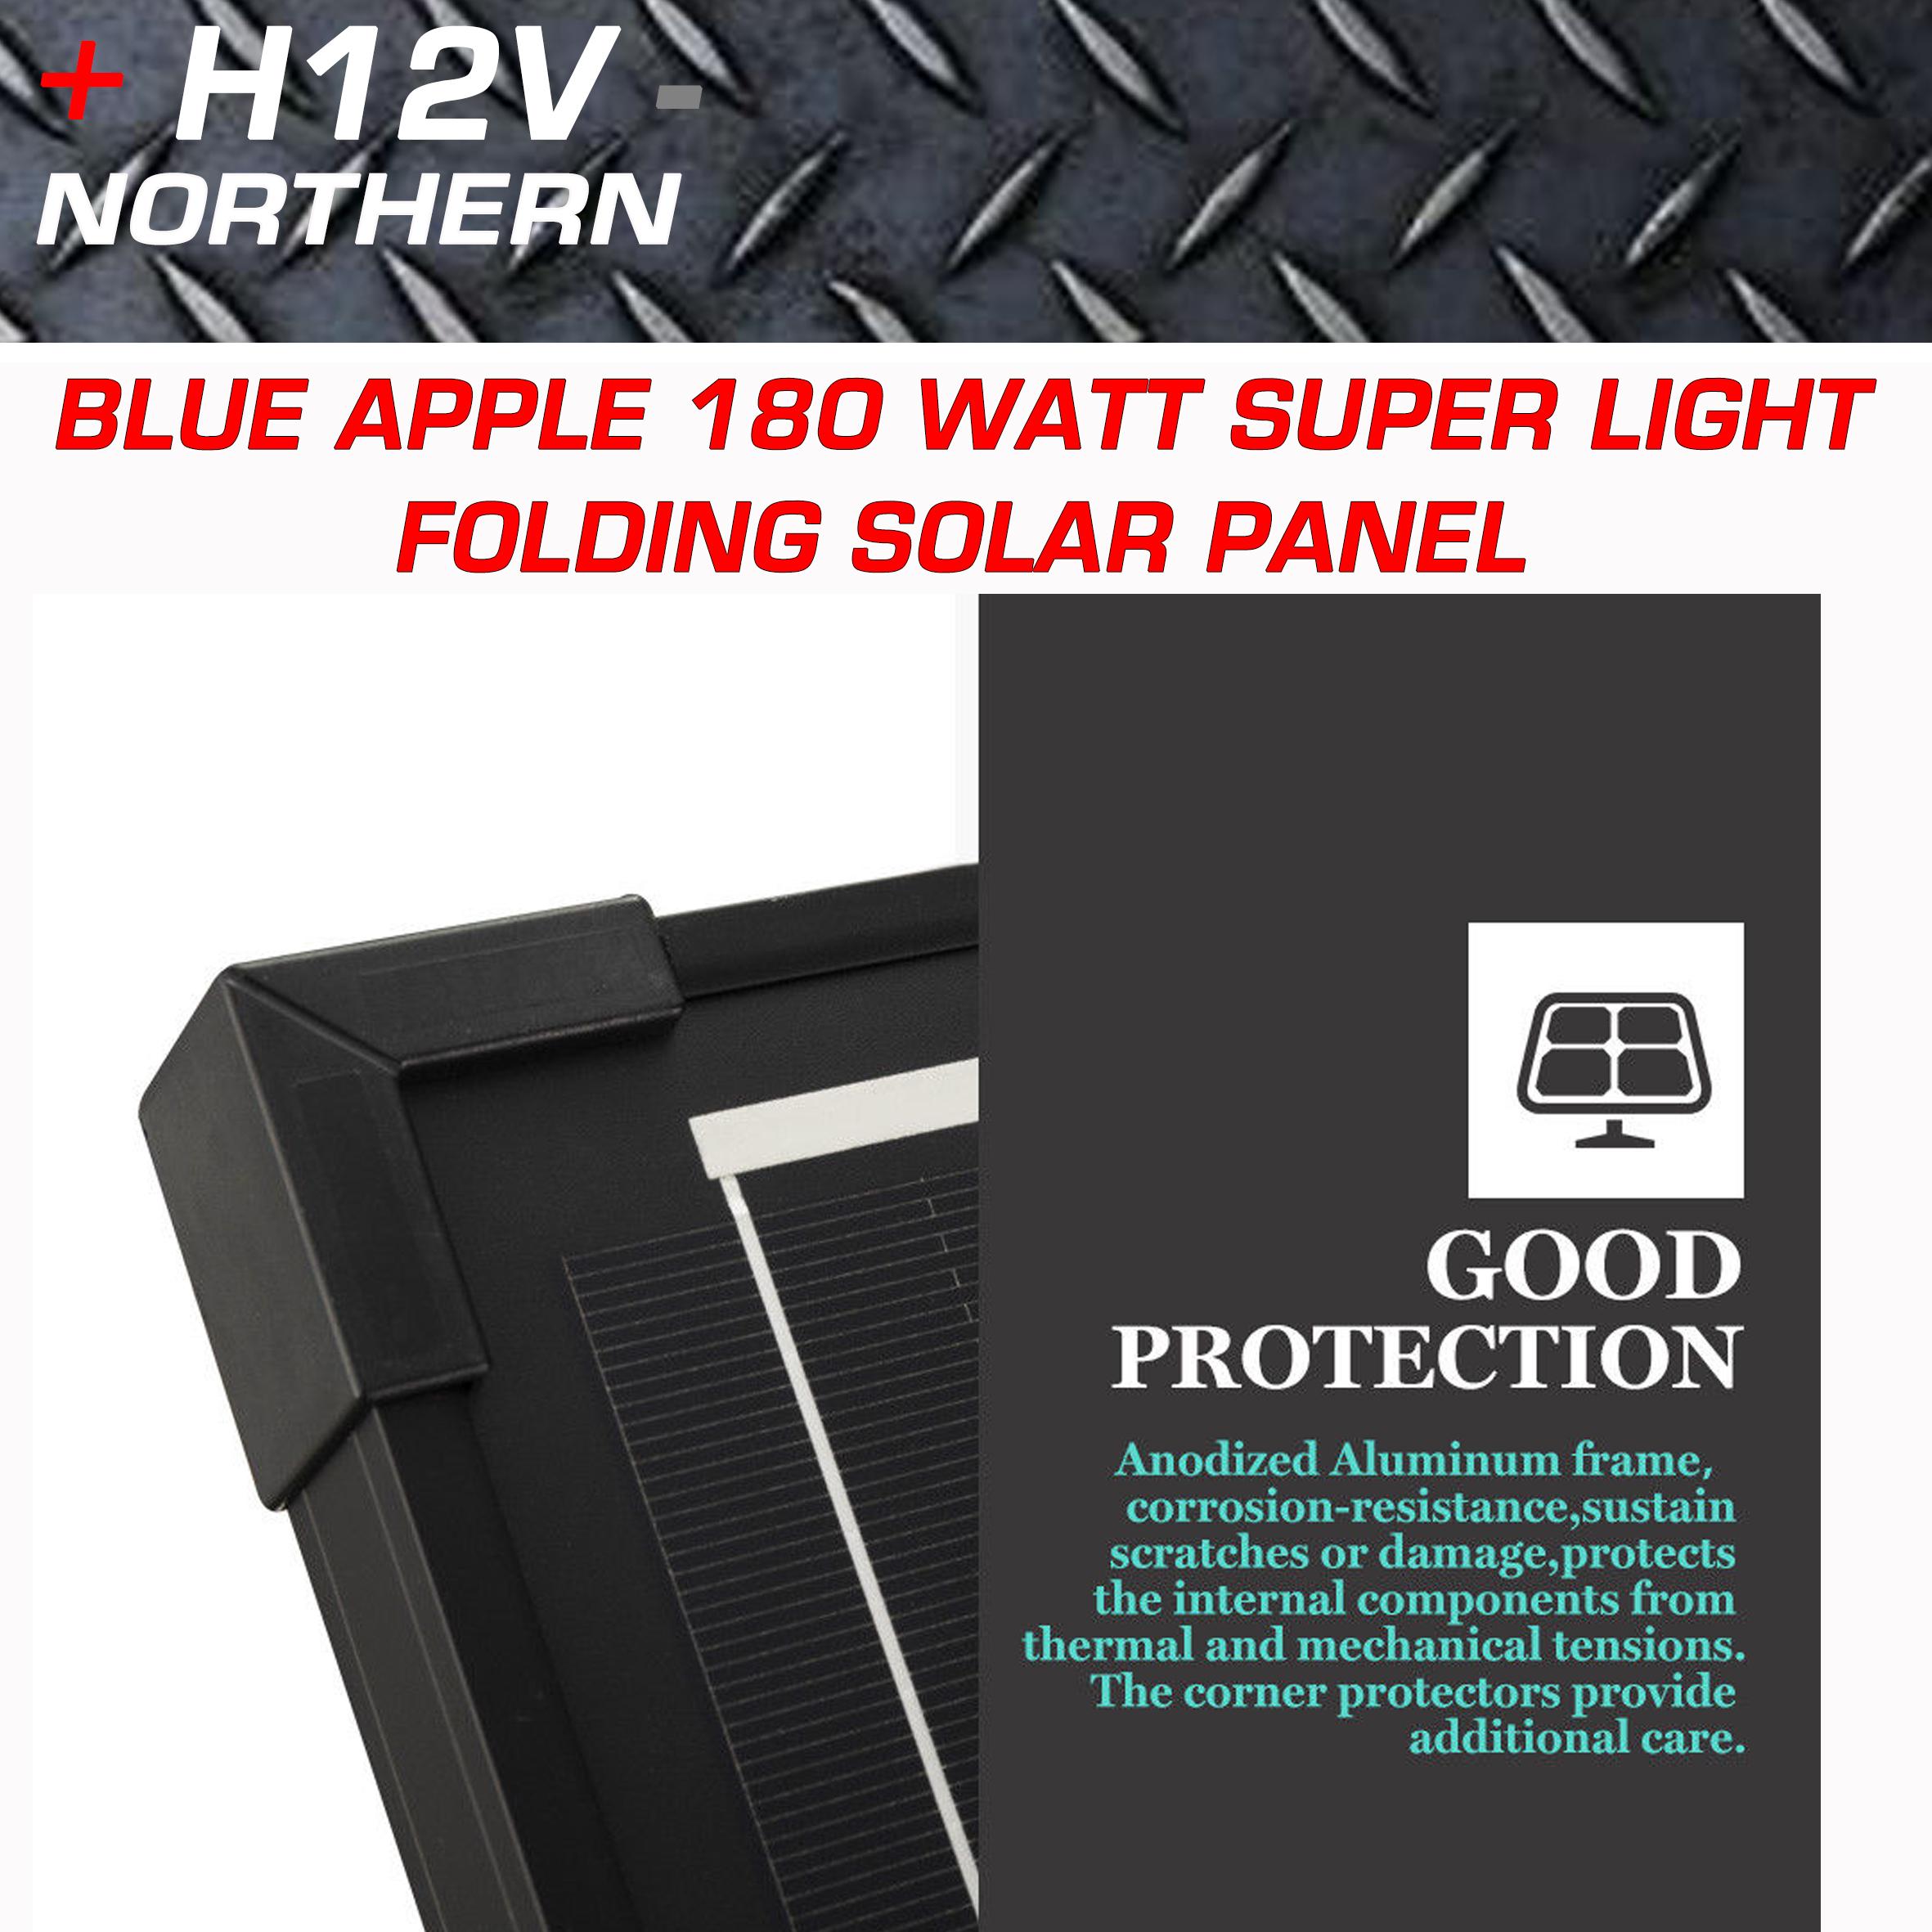 Blue Apple 180 Watt Super Thin Portable Split Fold Panel